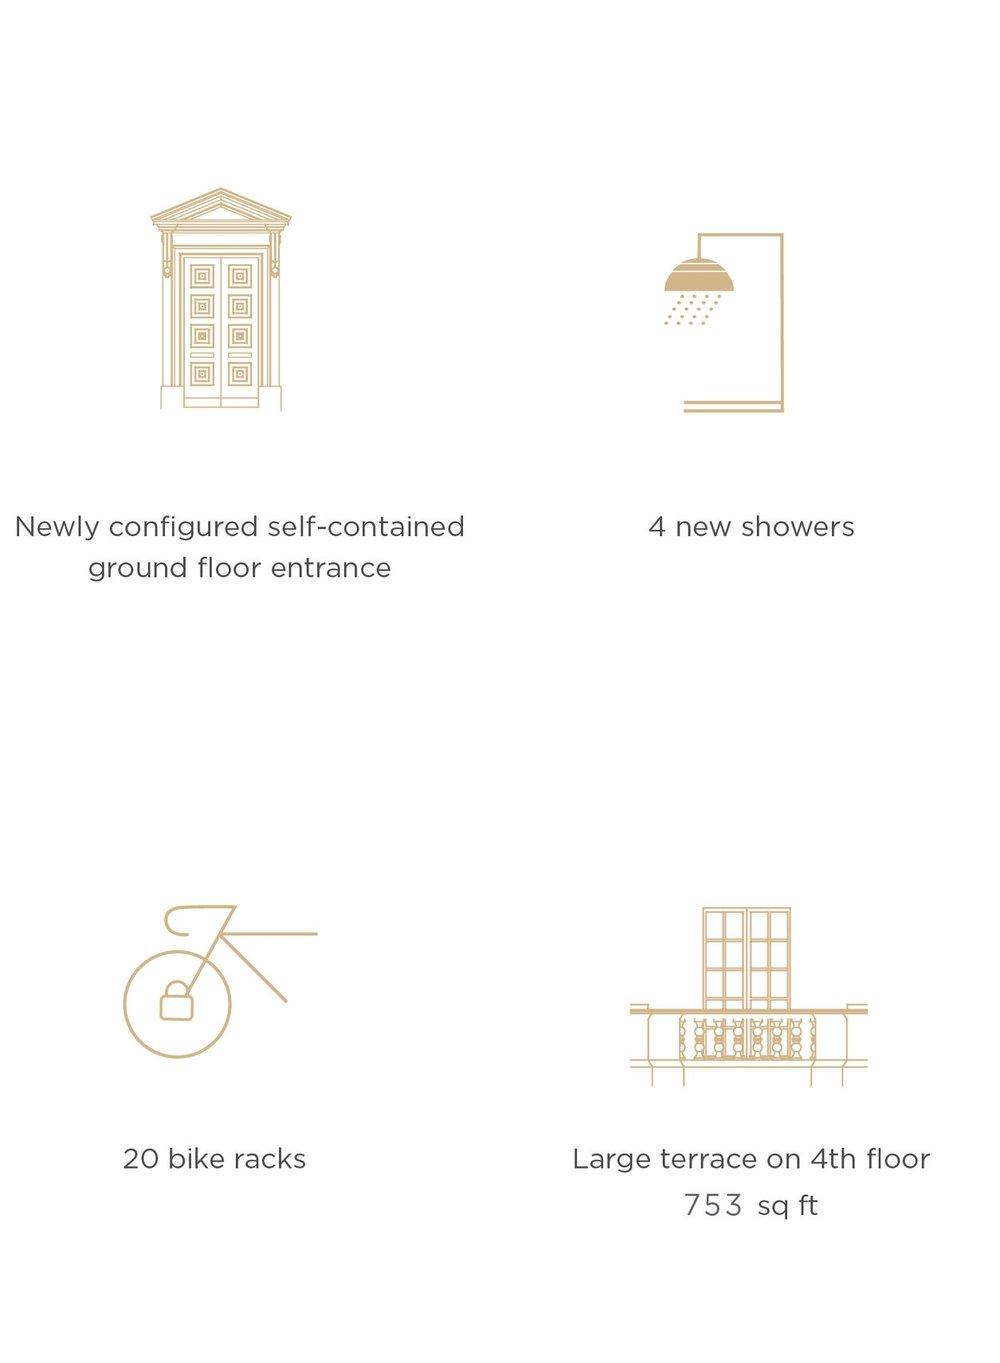 ArchitectBrochure_Feature Icons.jpg